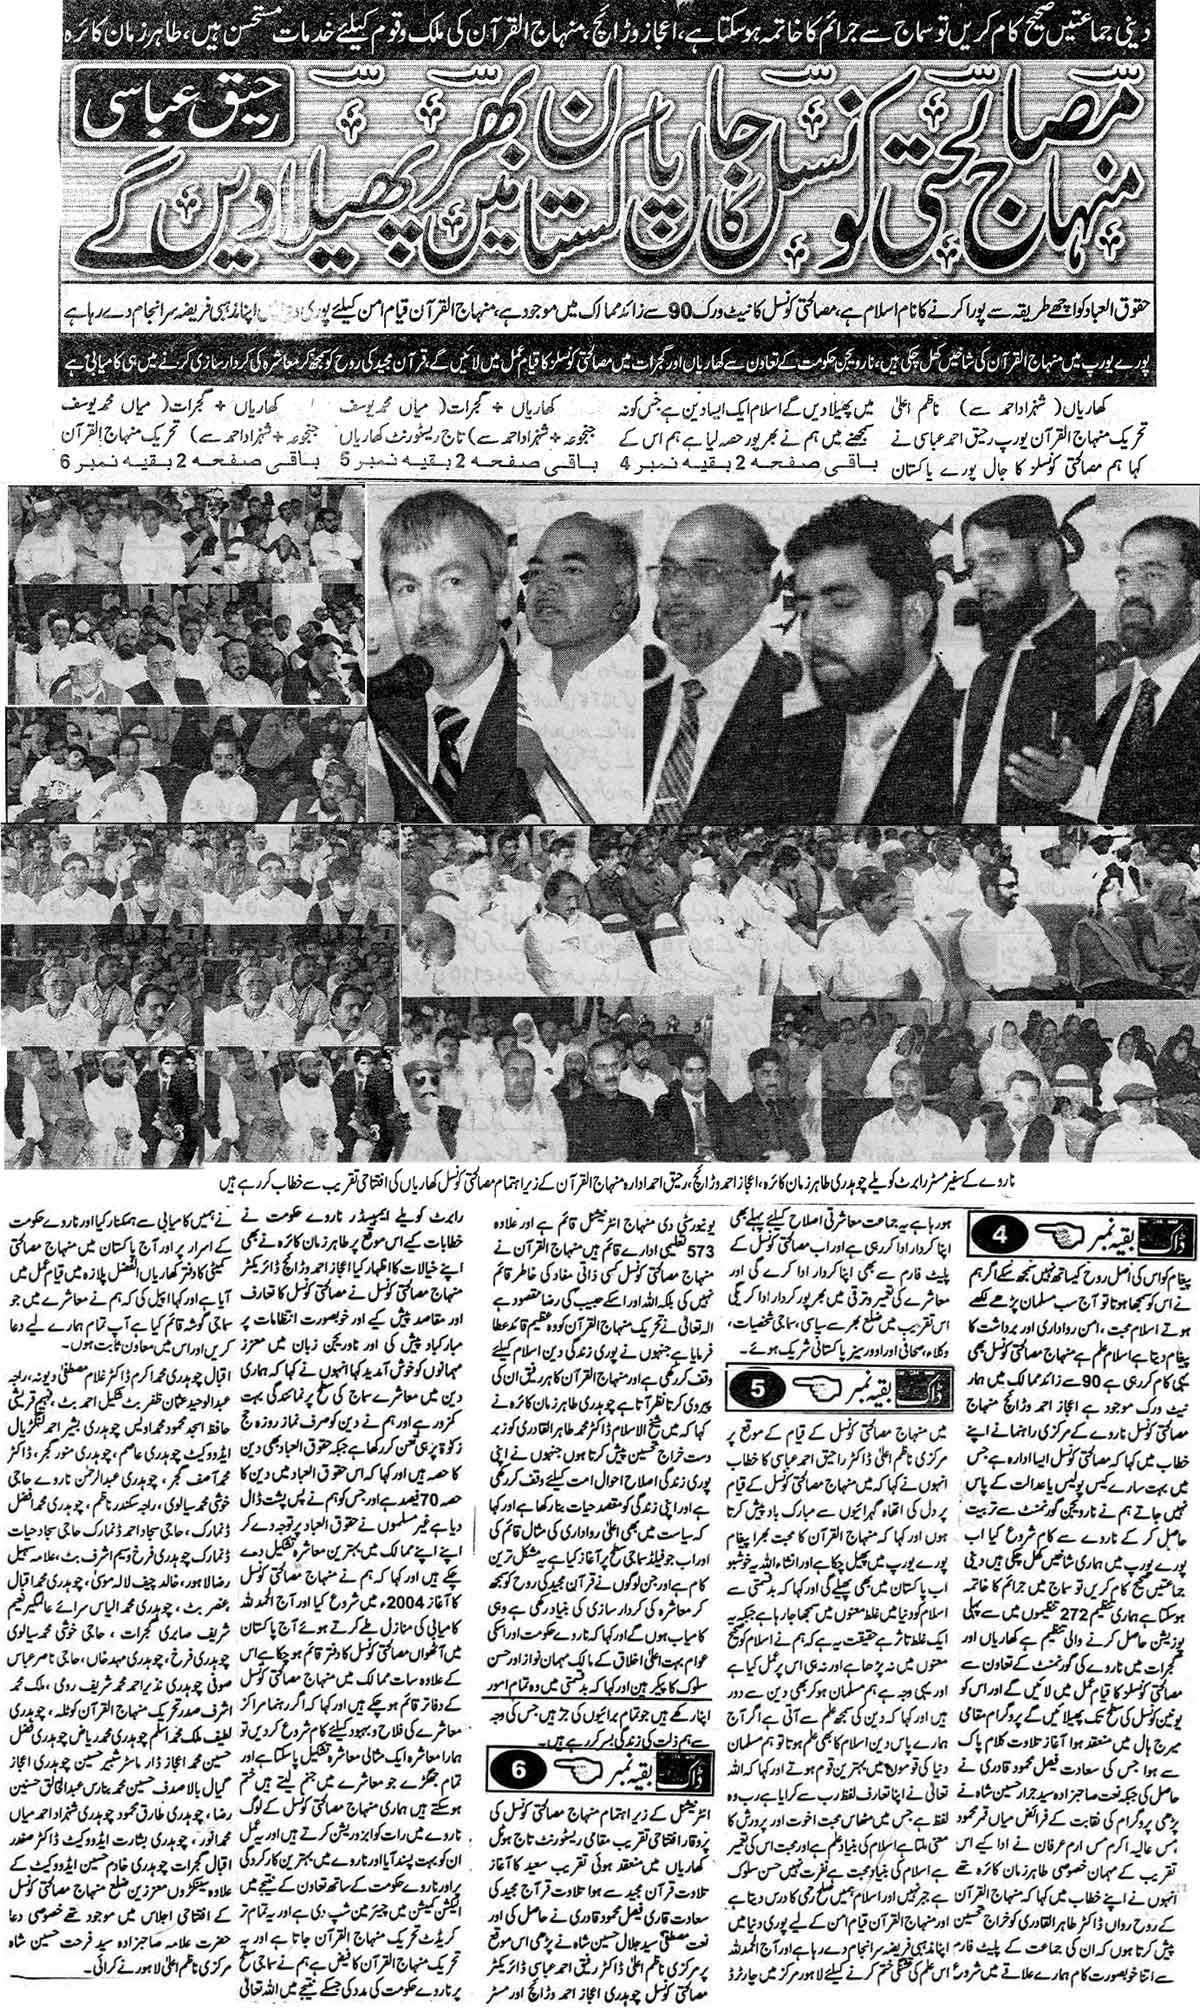 تحریک منہاج القرآن Minhaj-ul-Quran  Print Media Coverage پرنٹ میڈیا کوریج Daily Dak Gujrat